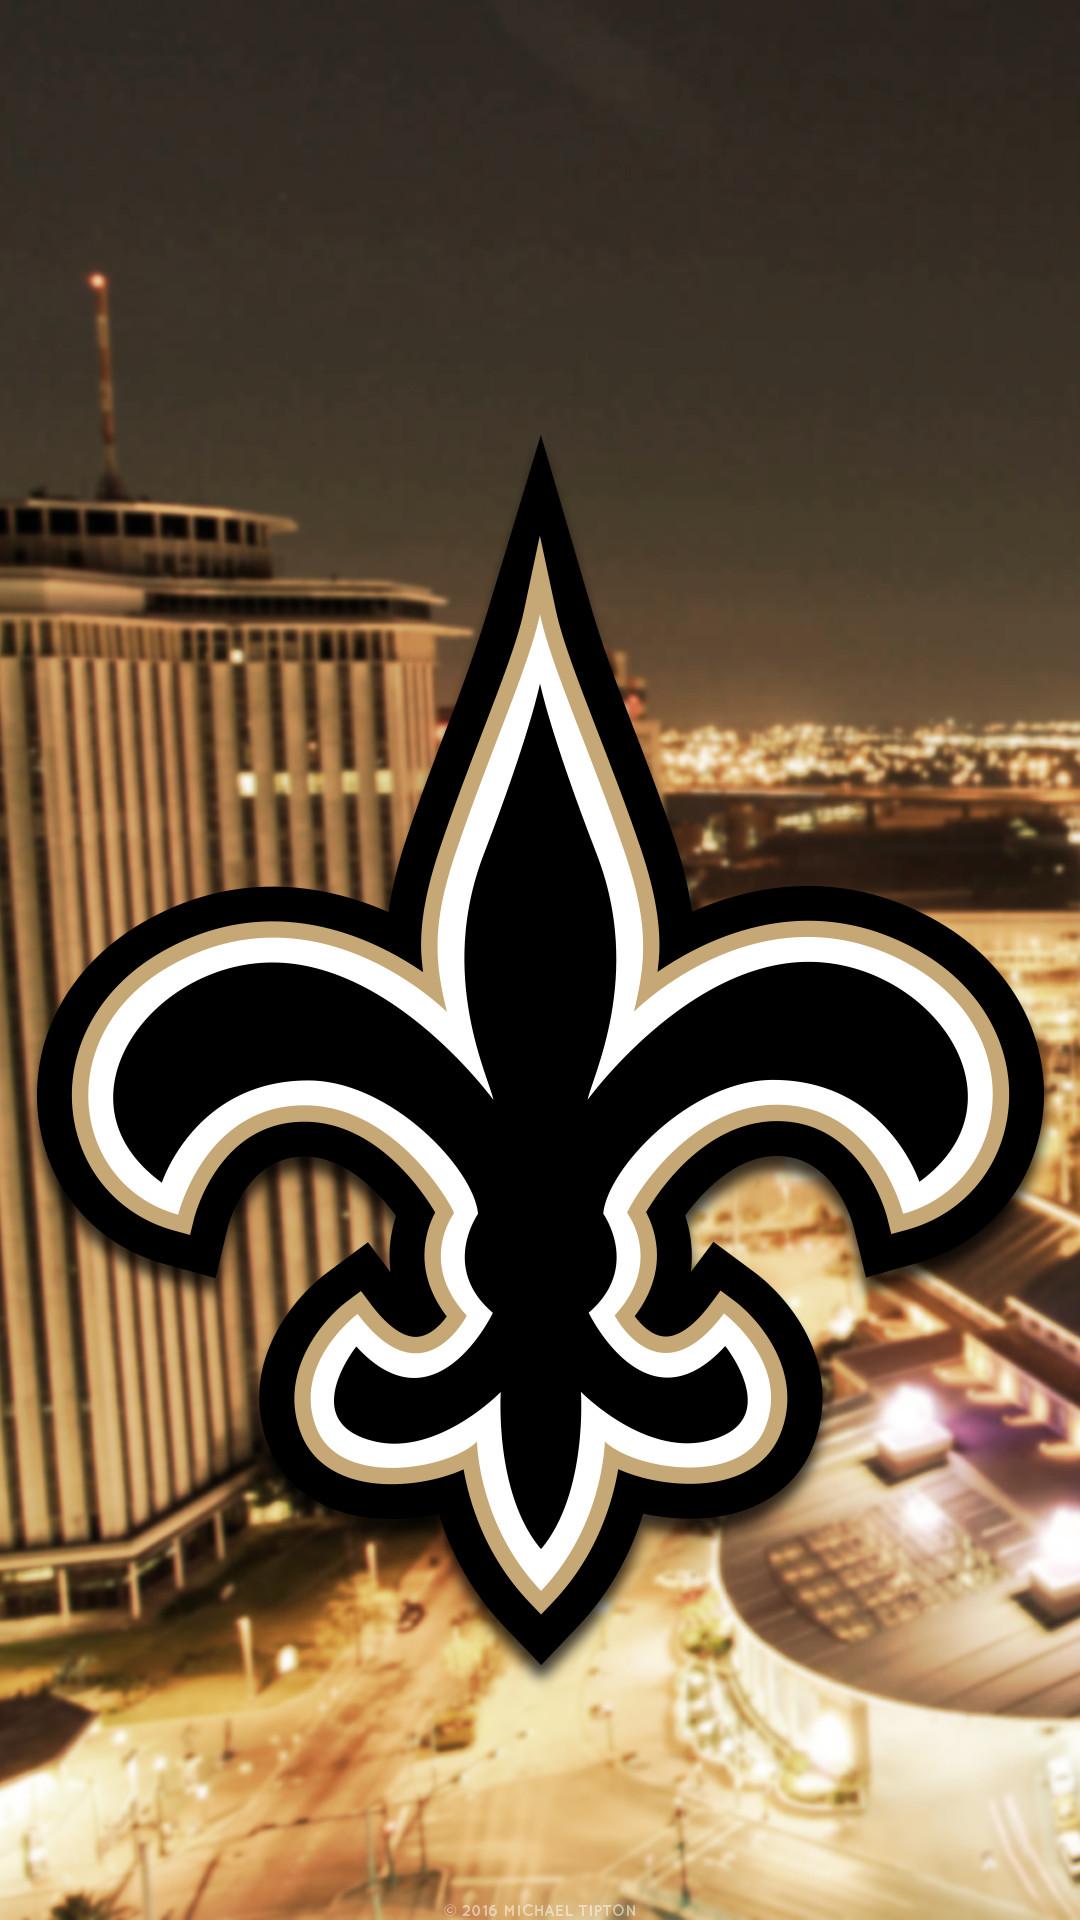 New Orleans Saints Wallpaper 2018 ·① WallpaperTag